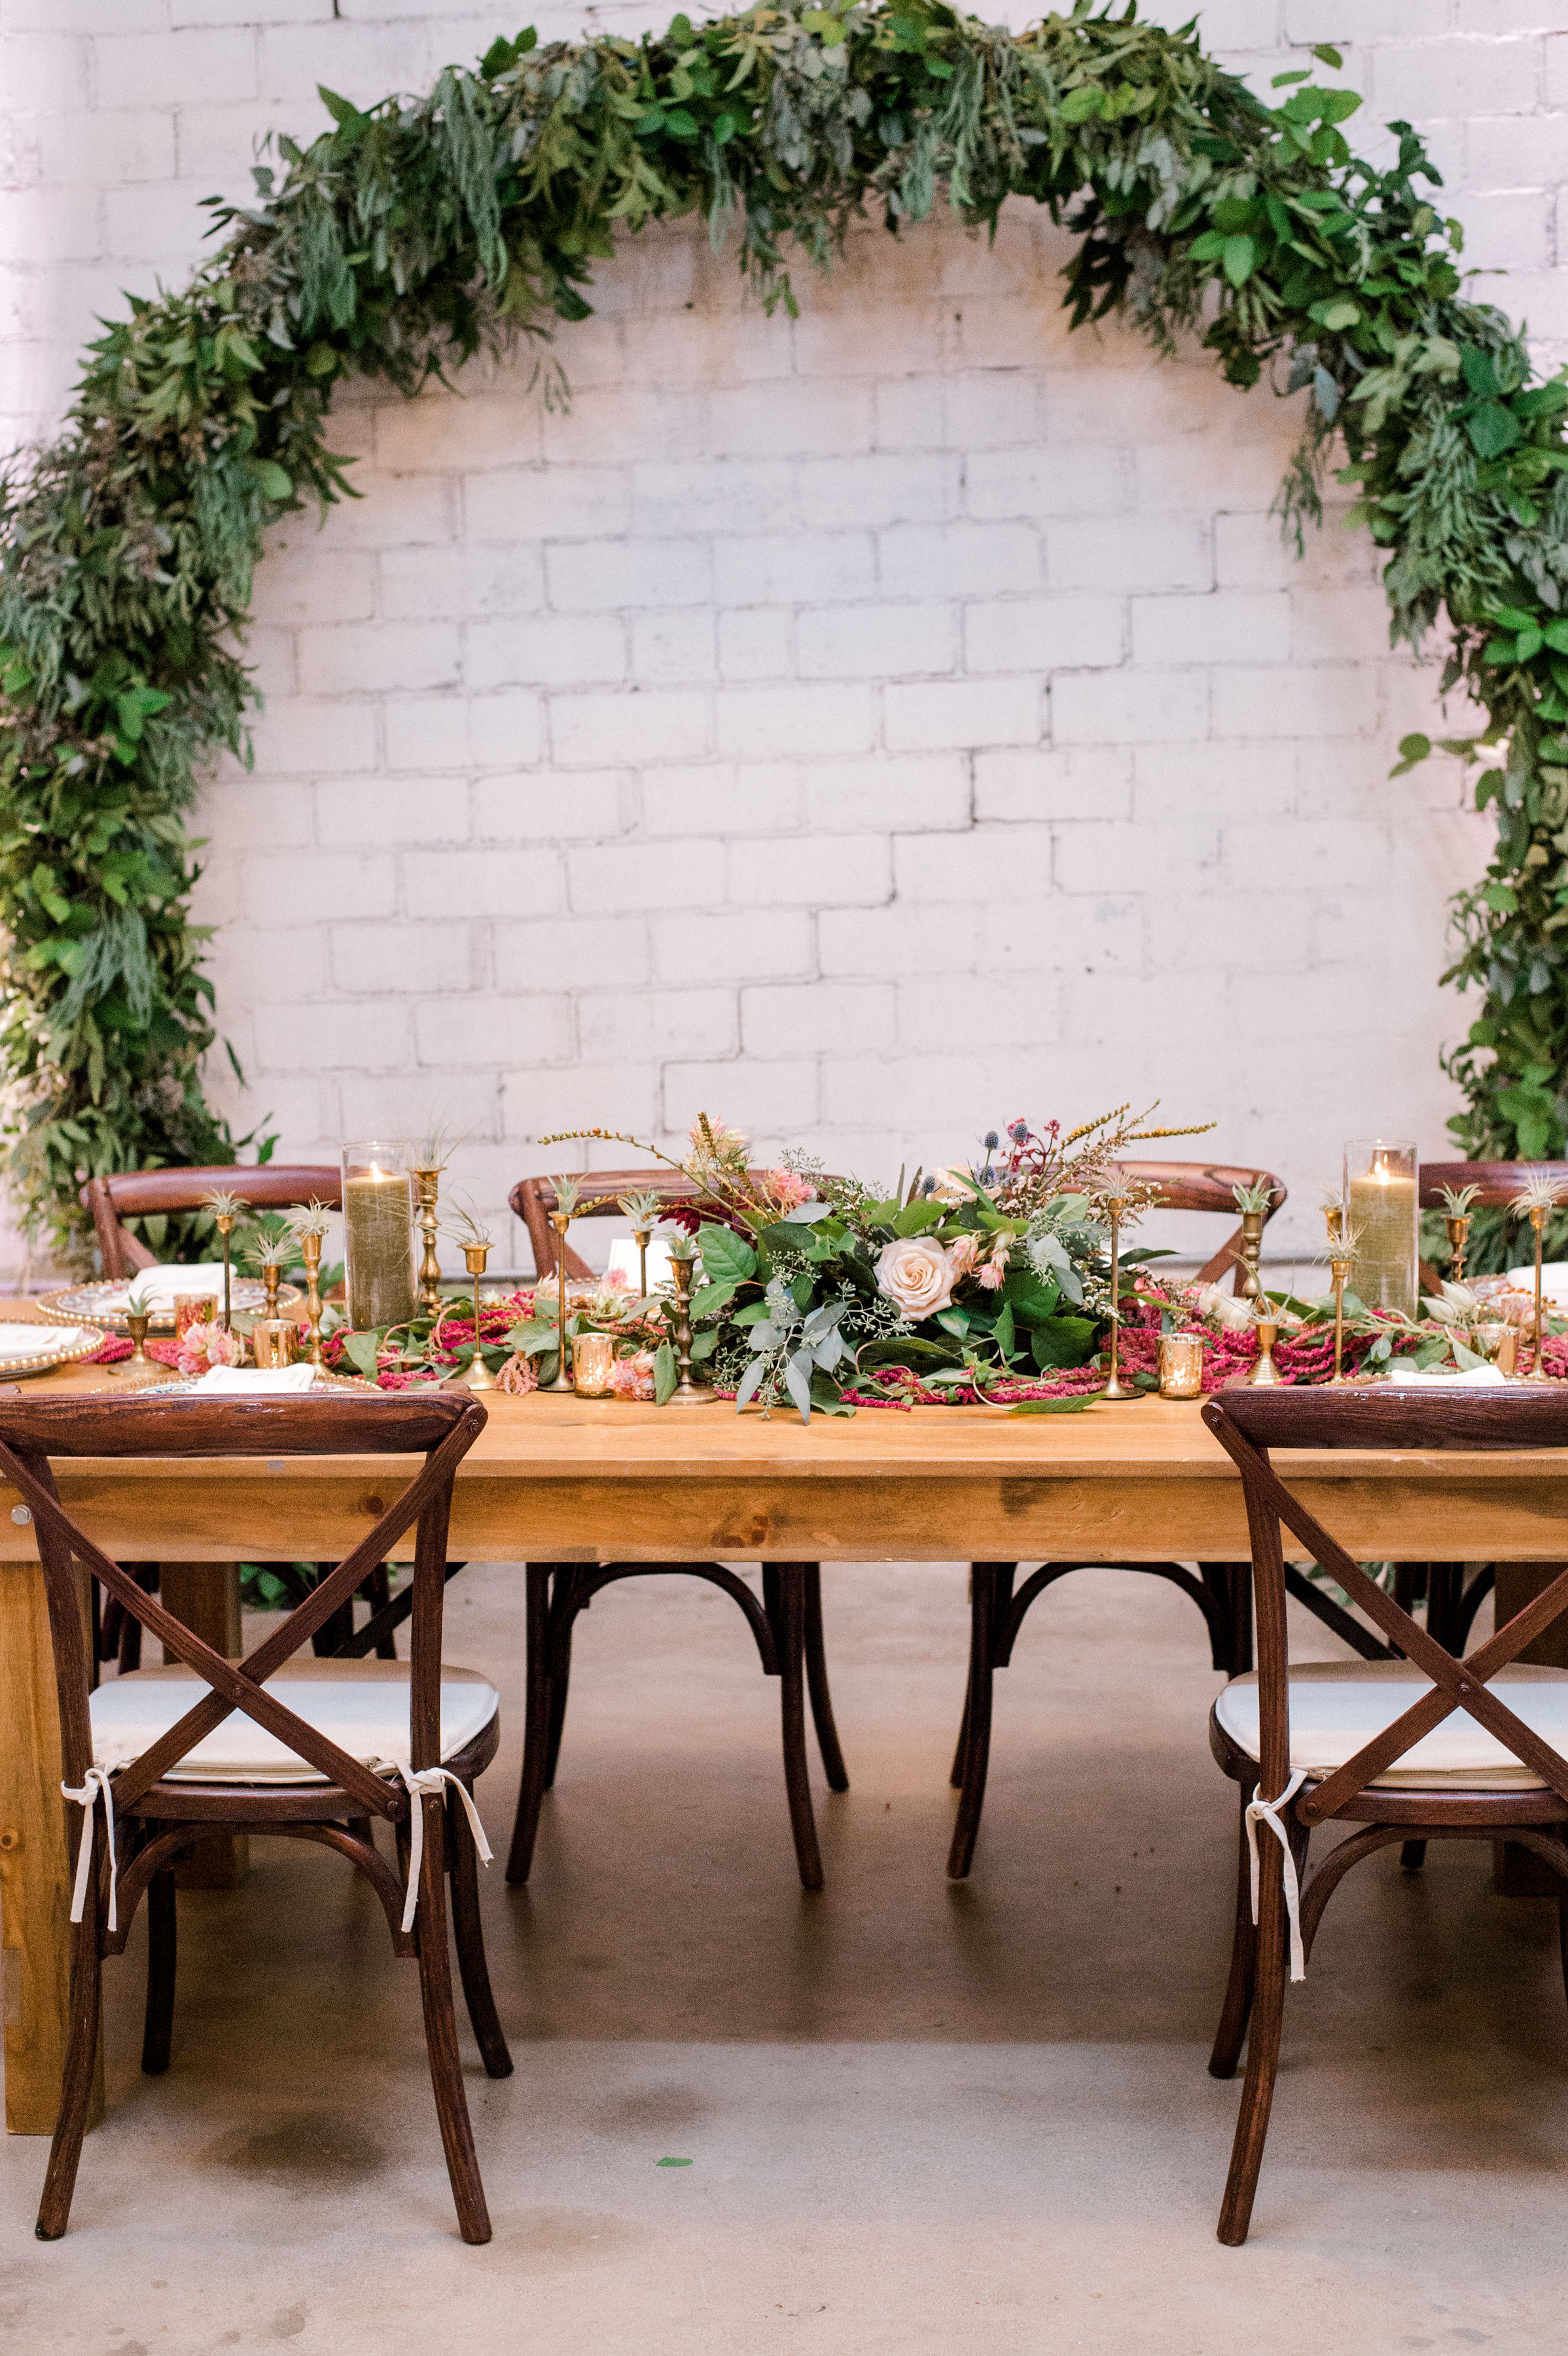 Fall Maroon Head Table | Industrial Vintage Fort Worth Wedding